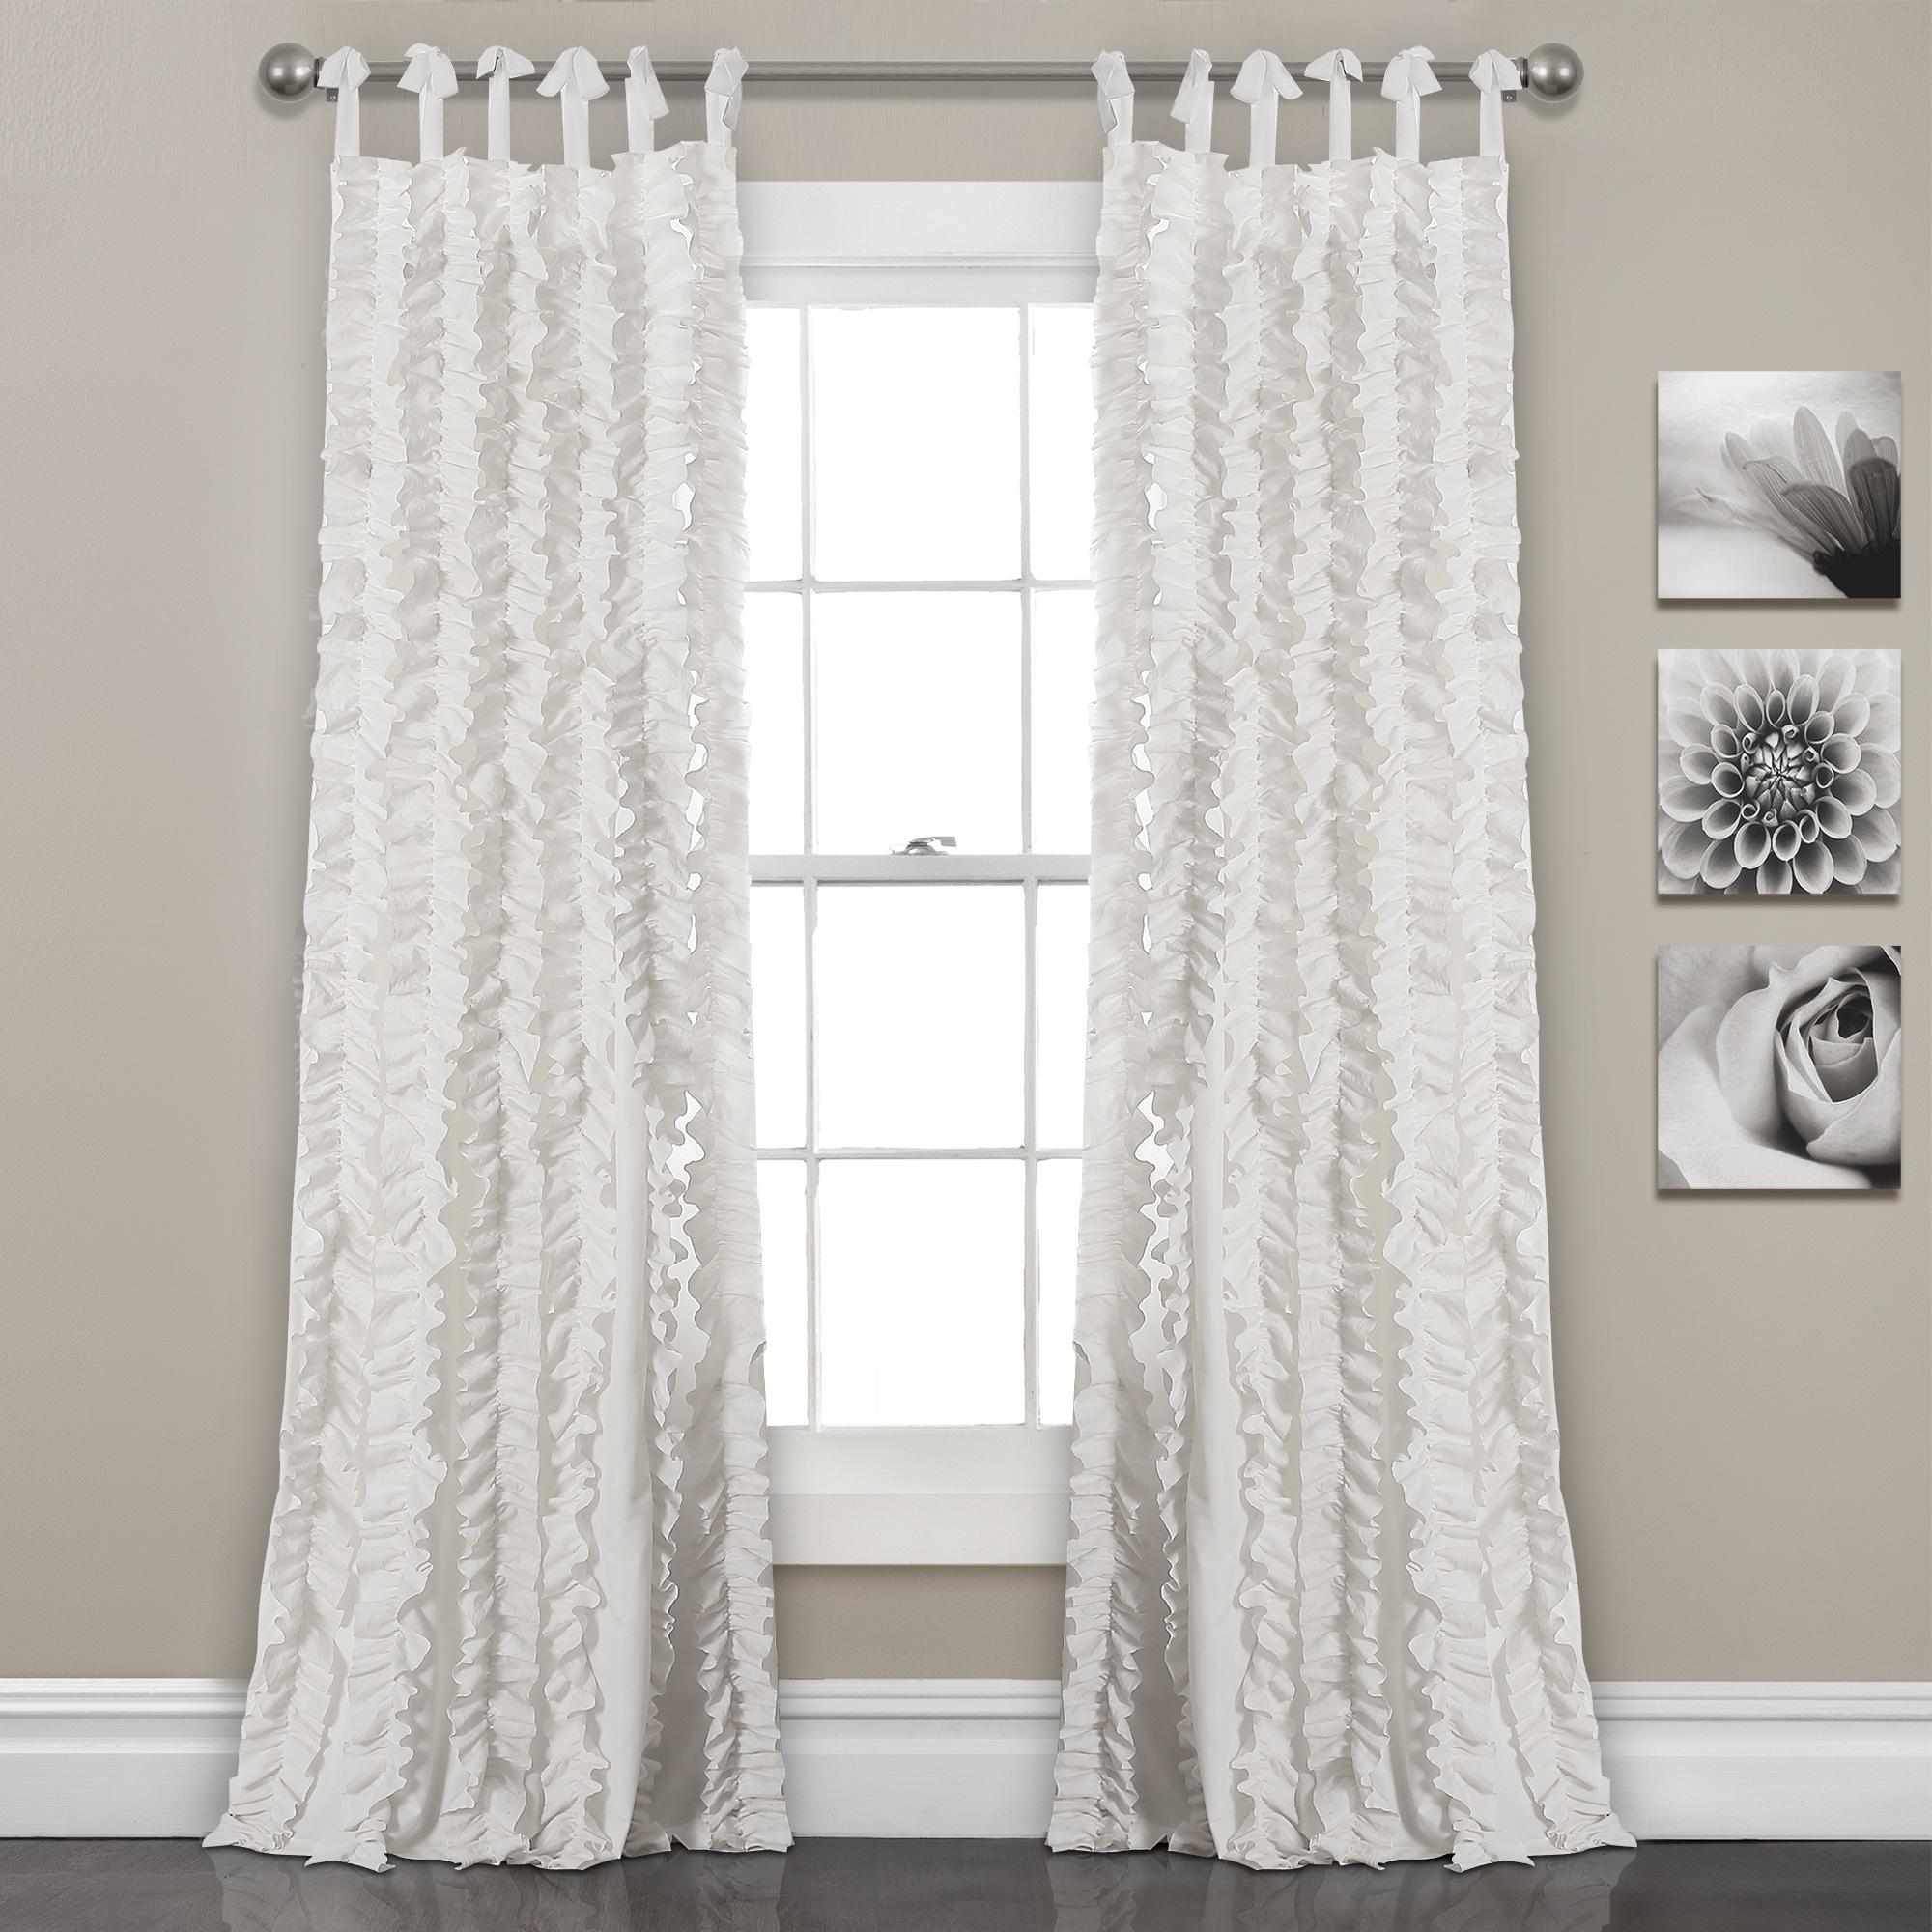 White 84'x40' Sophia Ruffle Window Curtain Set Regarding Lydia Ruffle Window Curtain Panel Pairs (View 7 of 20)